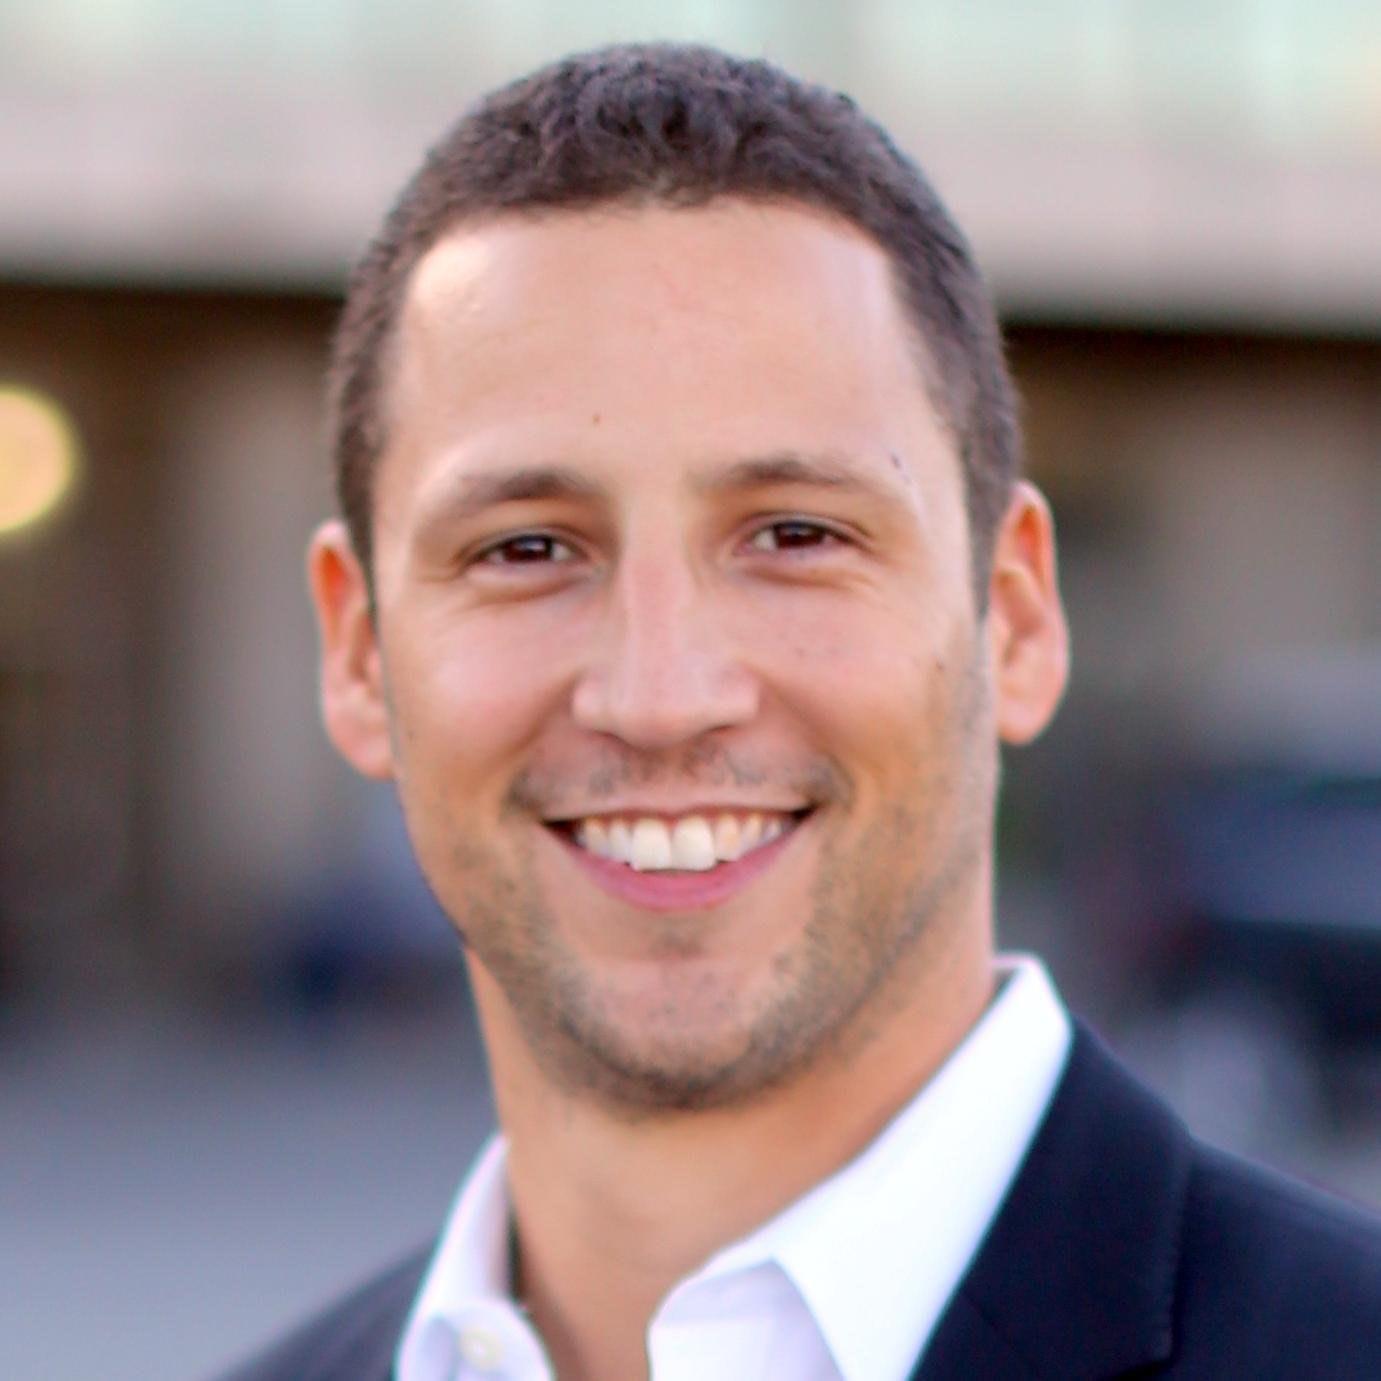 Gavin Delany